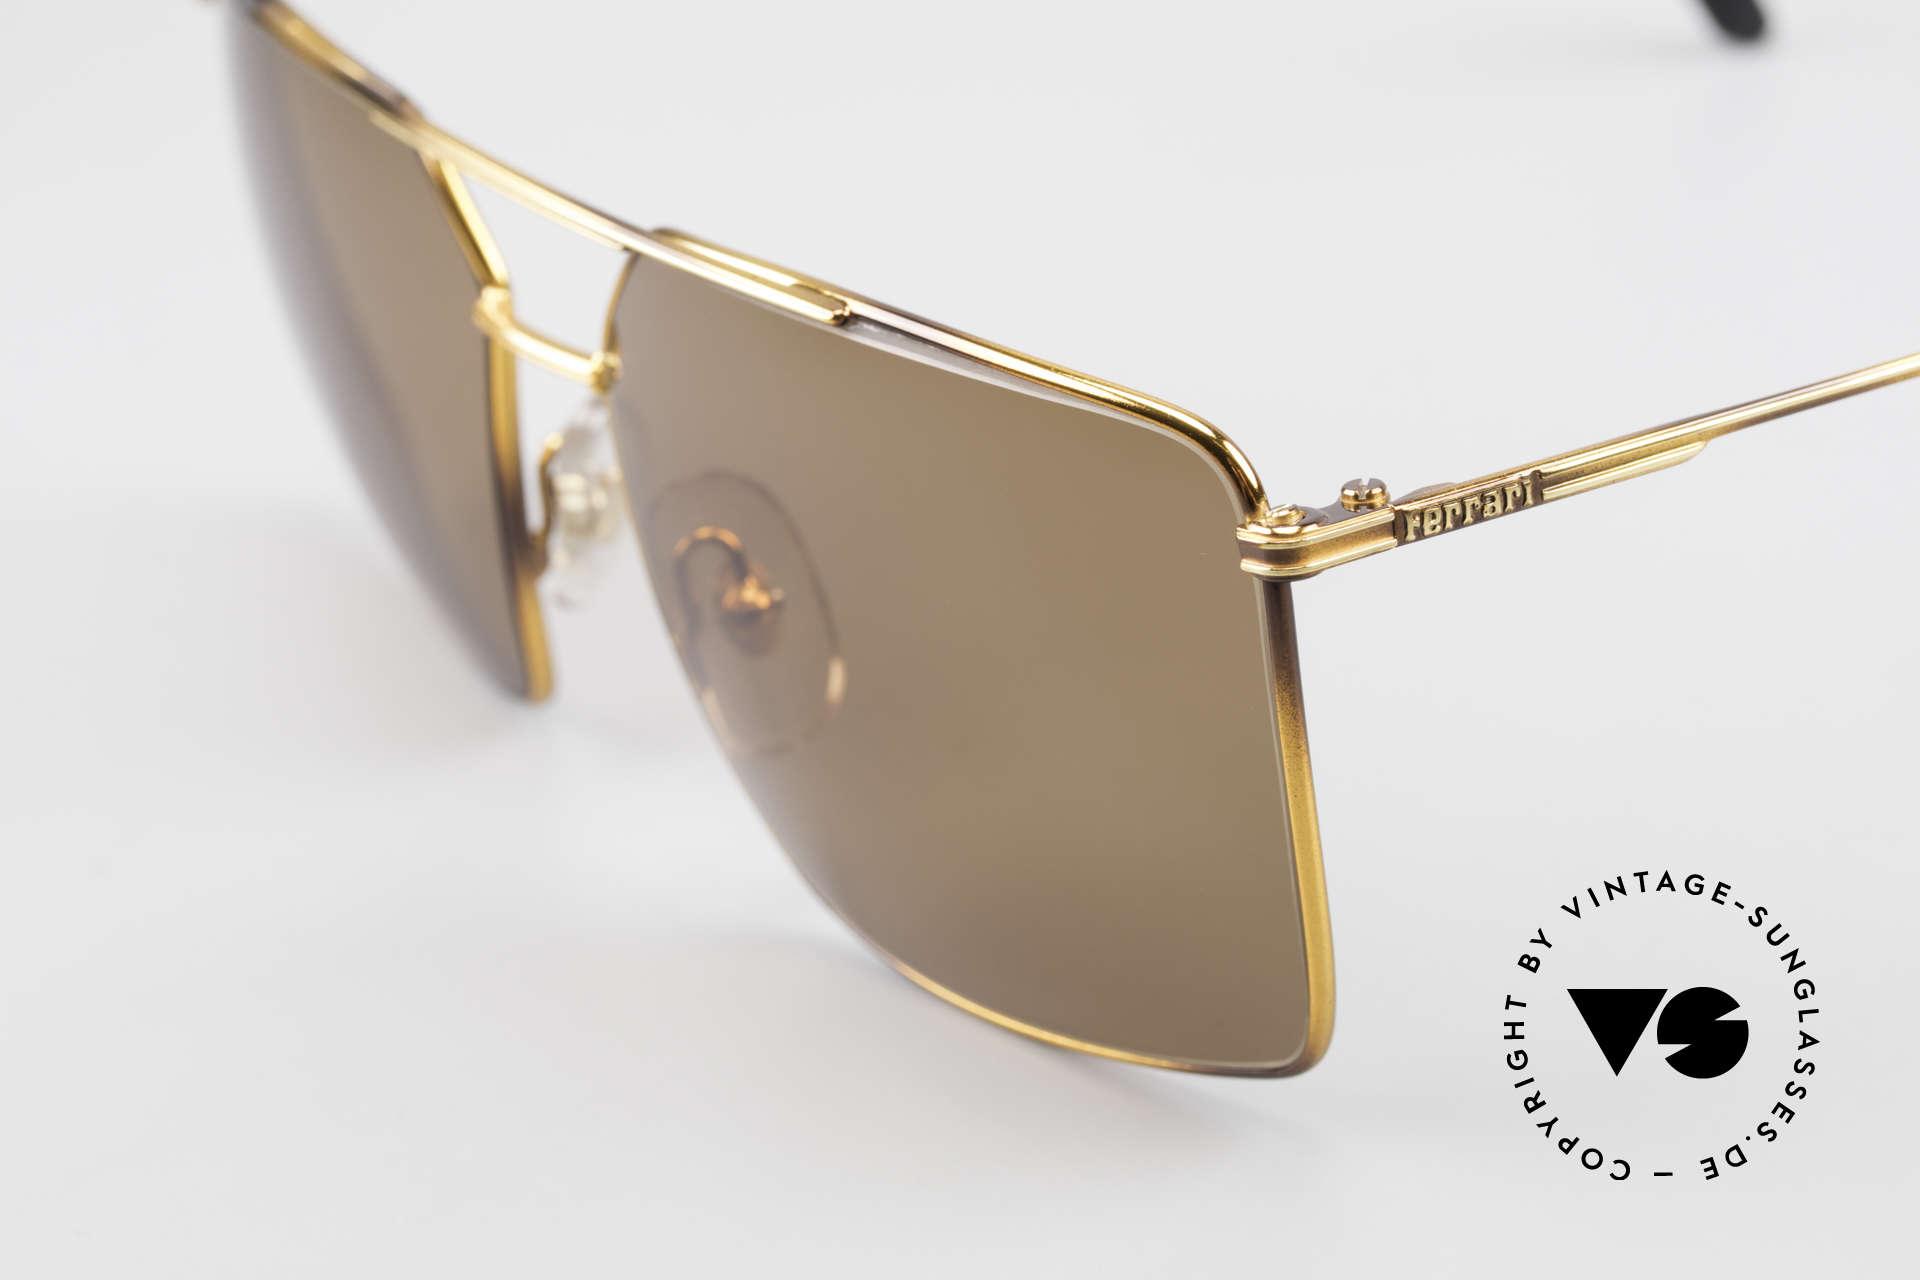 Ferrari F46 Retro Sunglasses True Vintage, never worn (like all our vintage 90's Ferrari specs), Made for Men